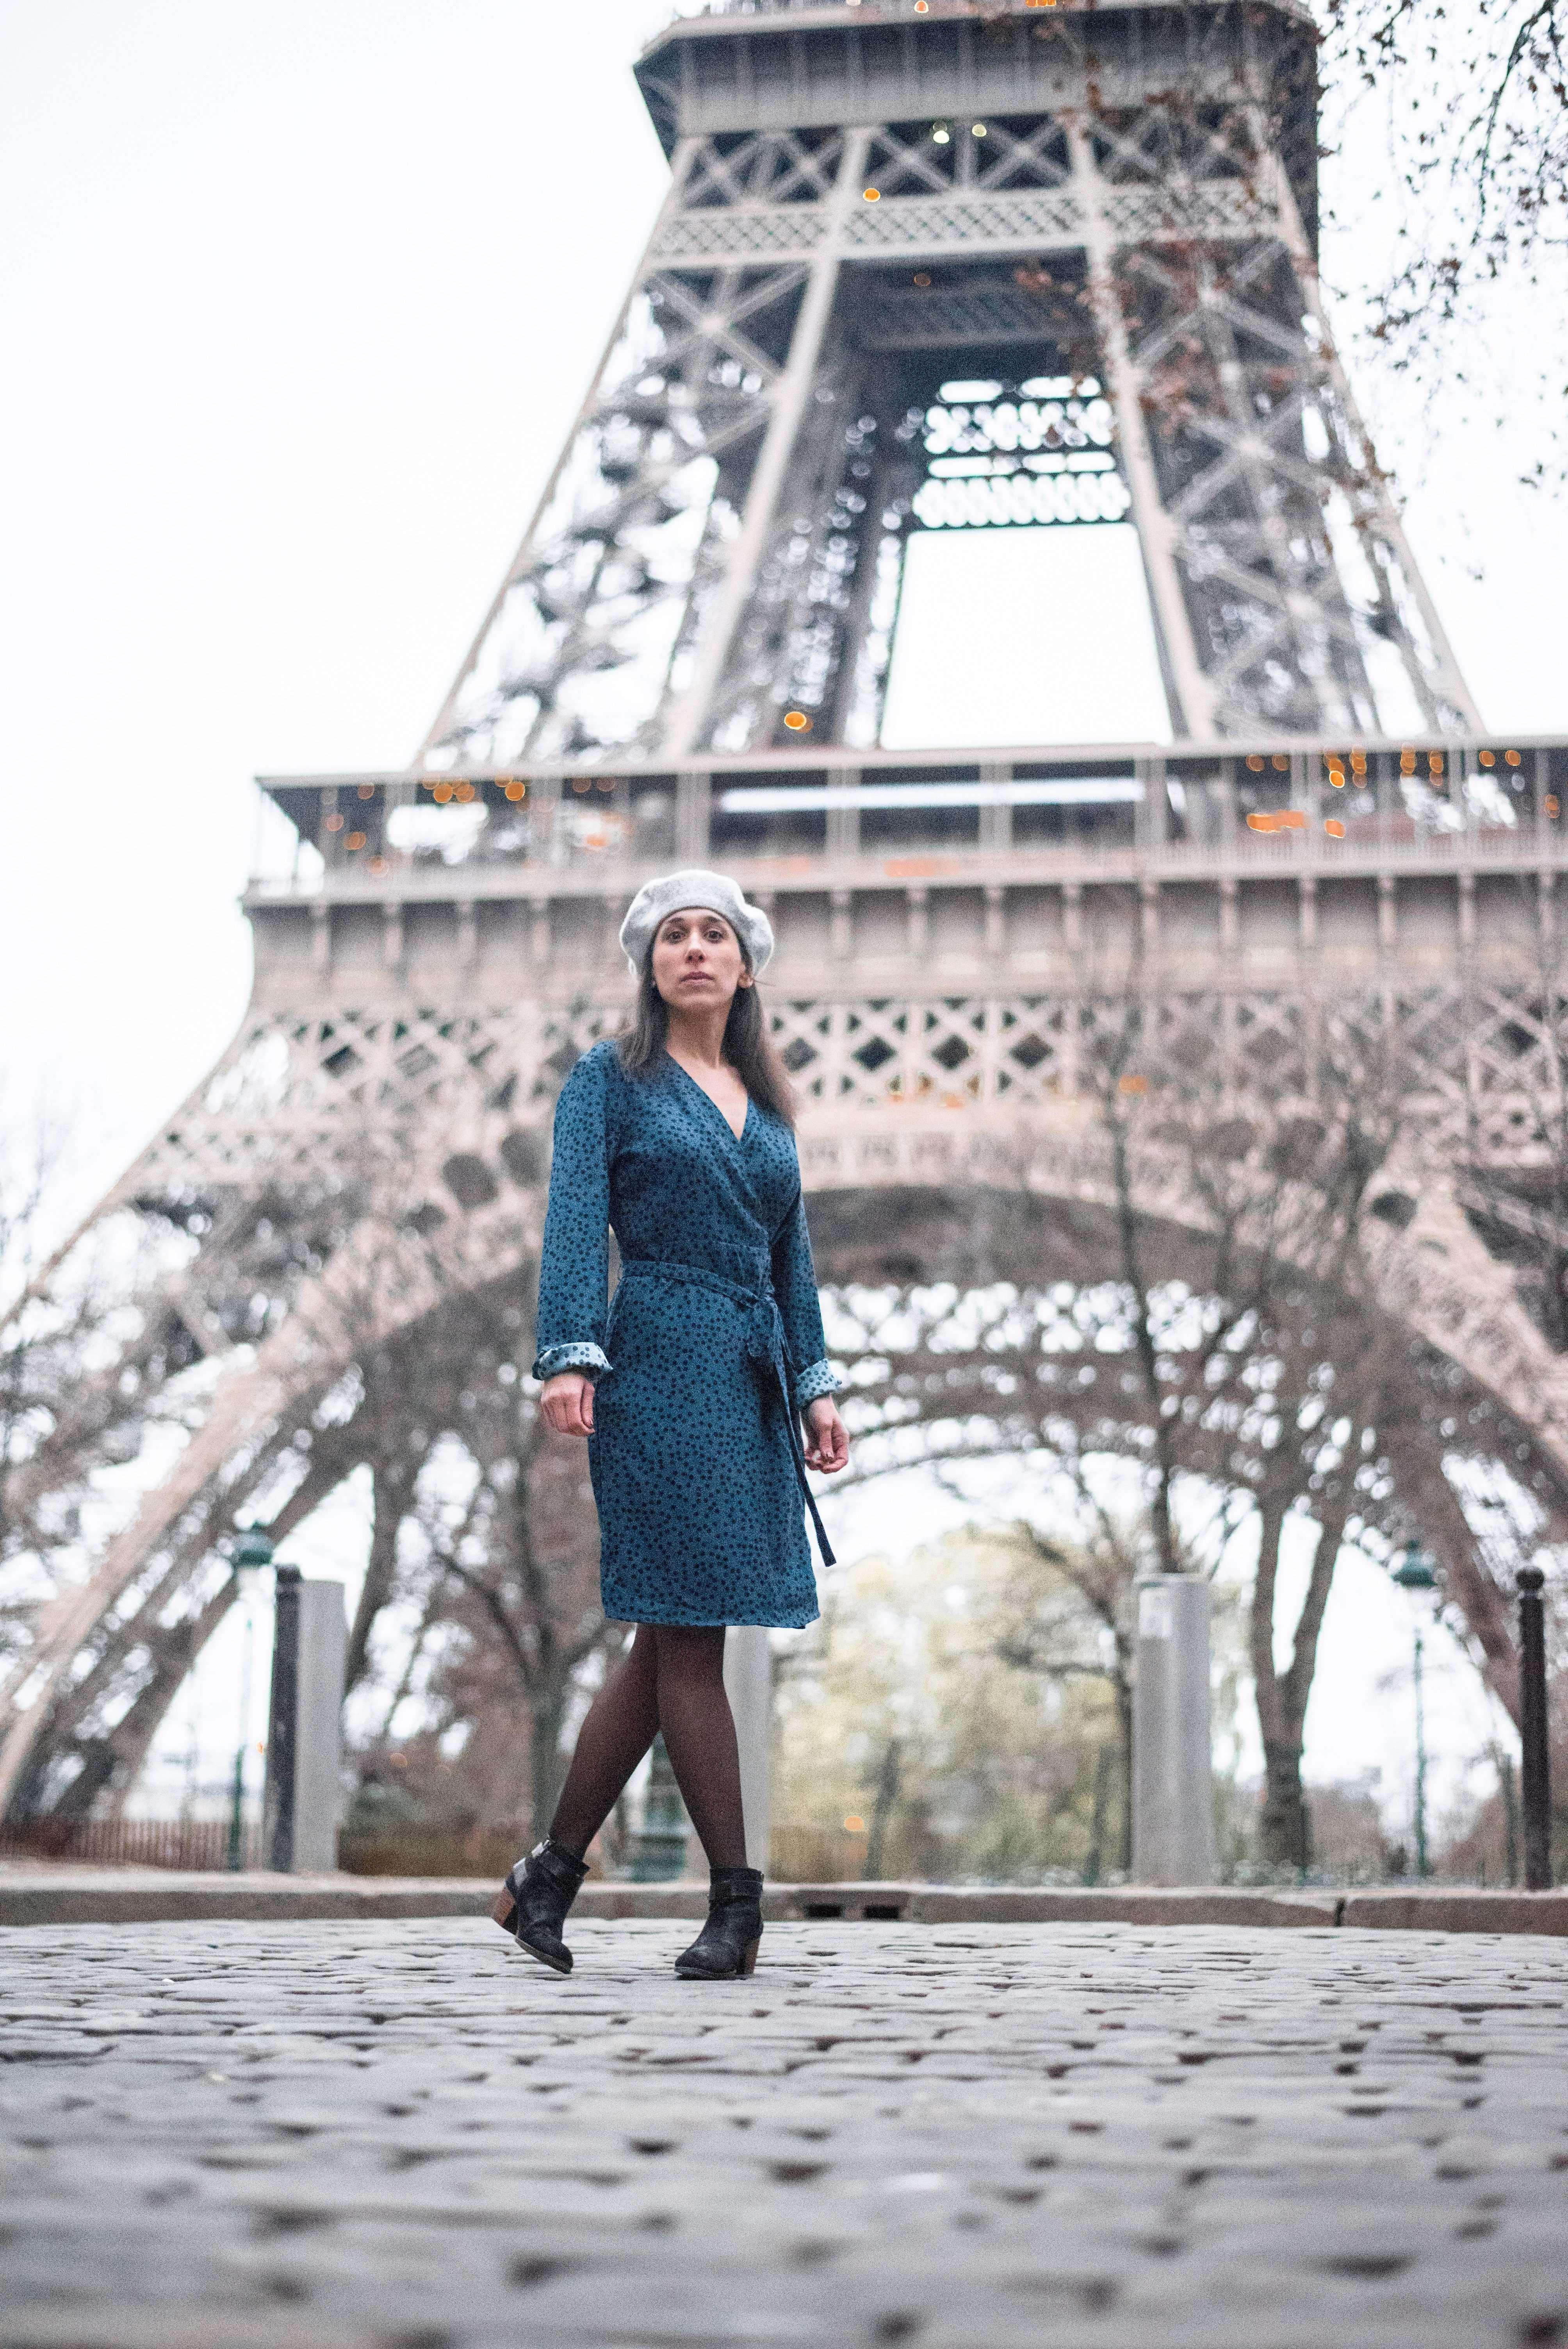 Eiffel Tower from Rue de l'Université